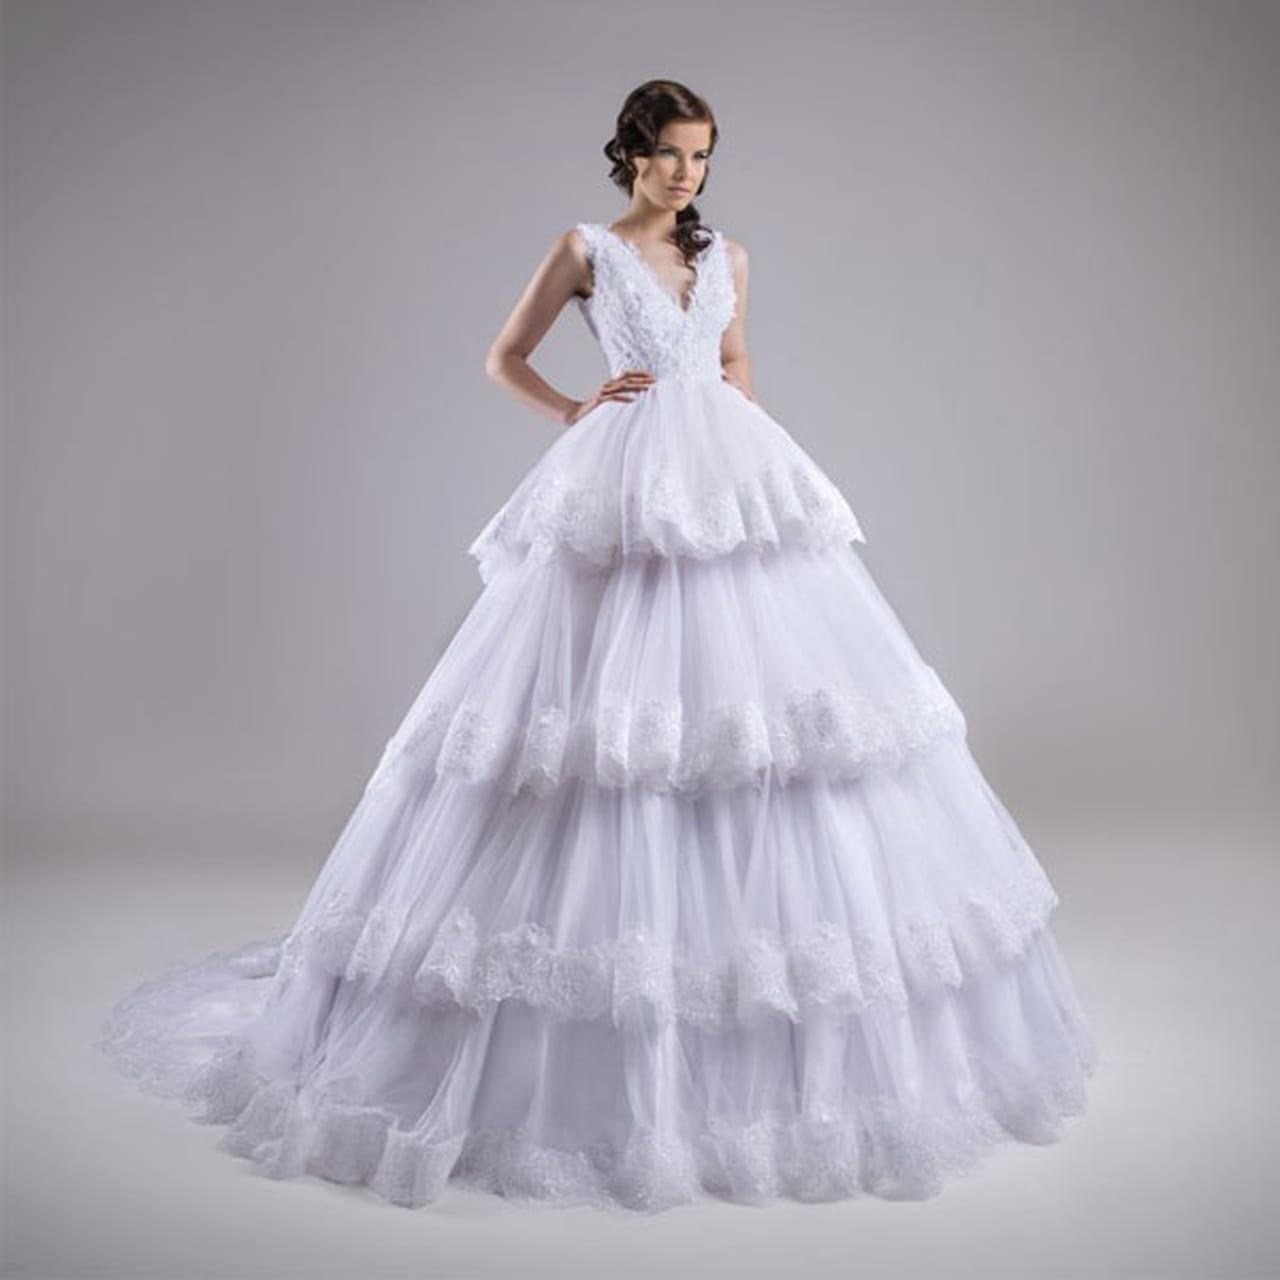 7087fd65fd814 فساتين زفاف منفوشة 2015 للمصممة كريستل عطاالله